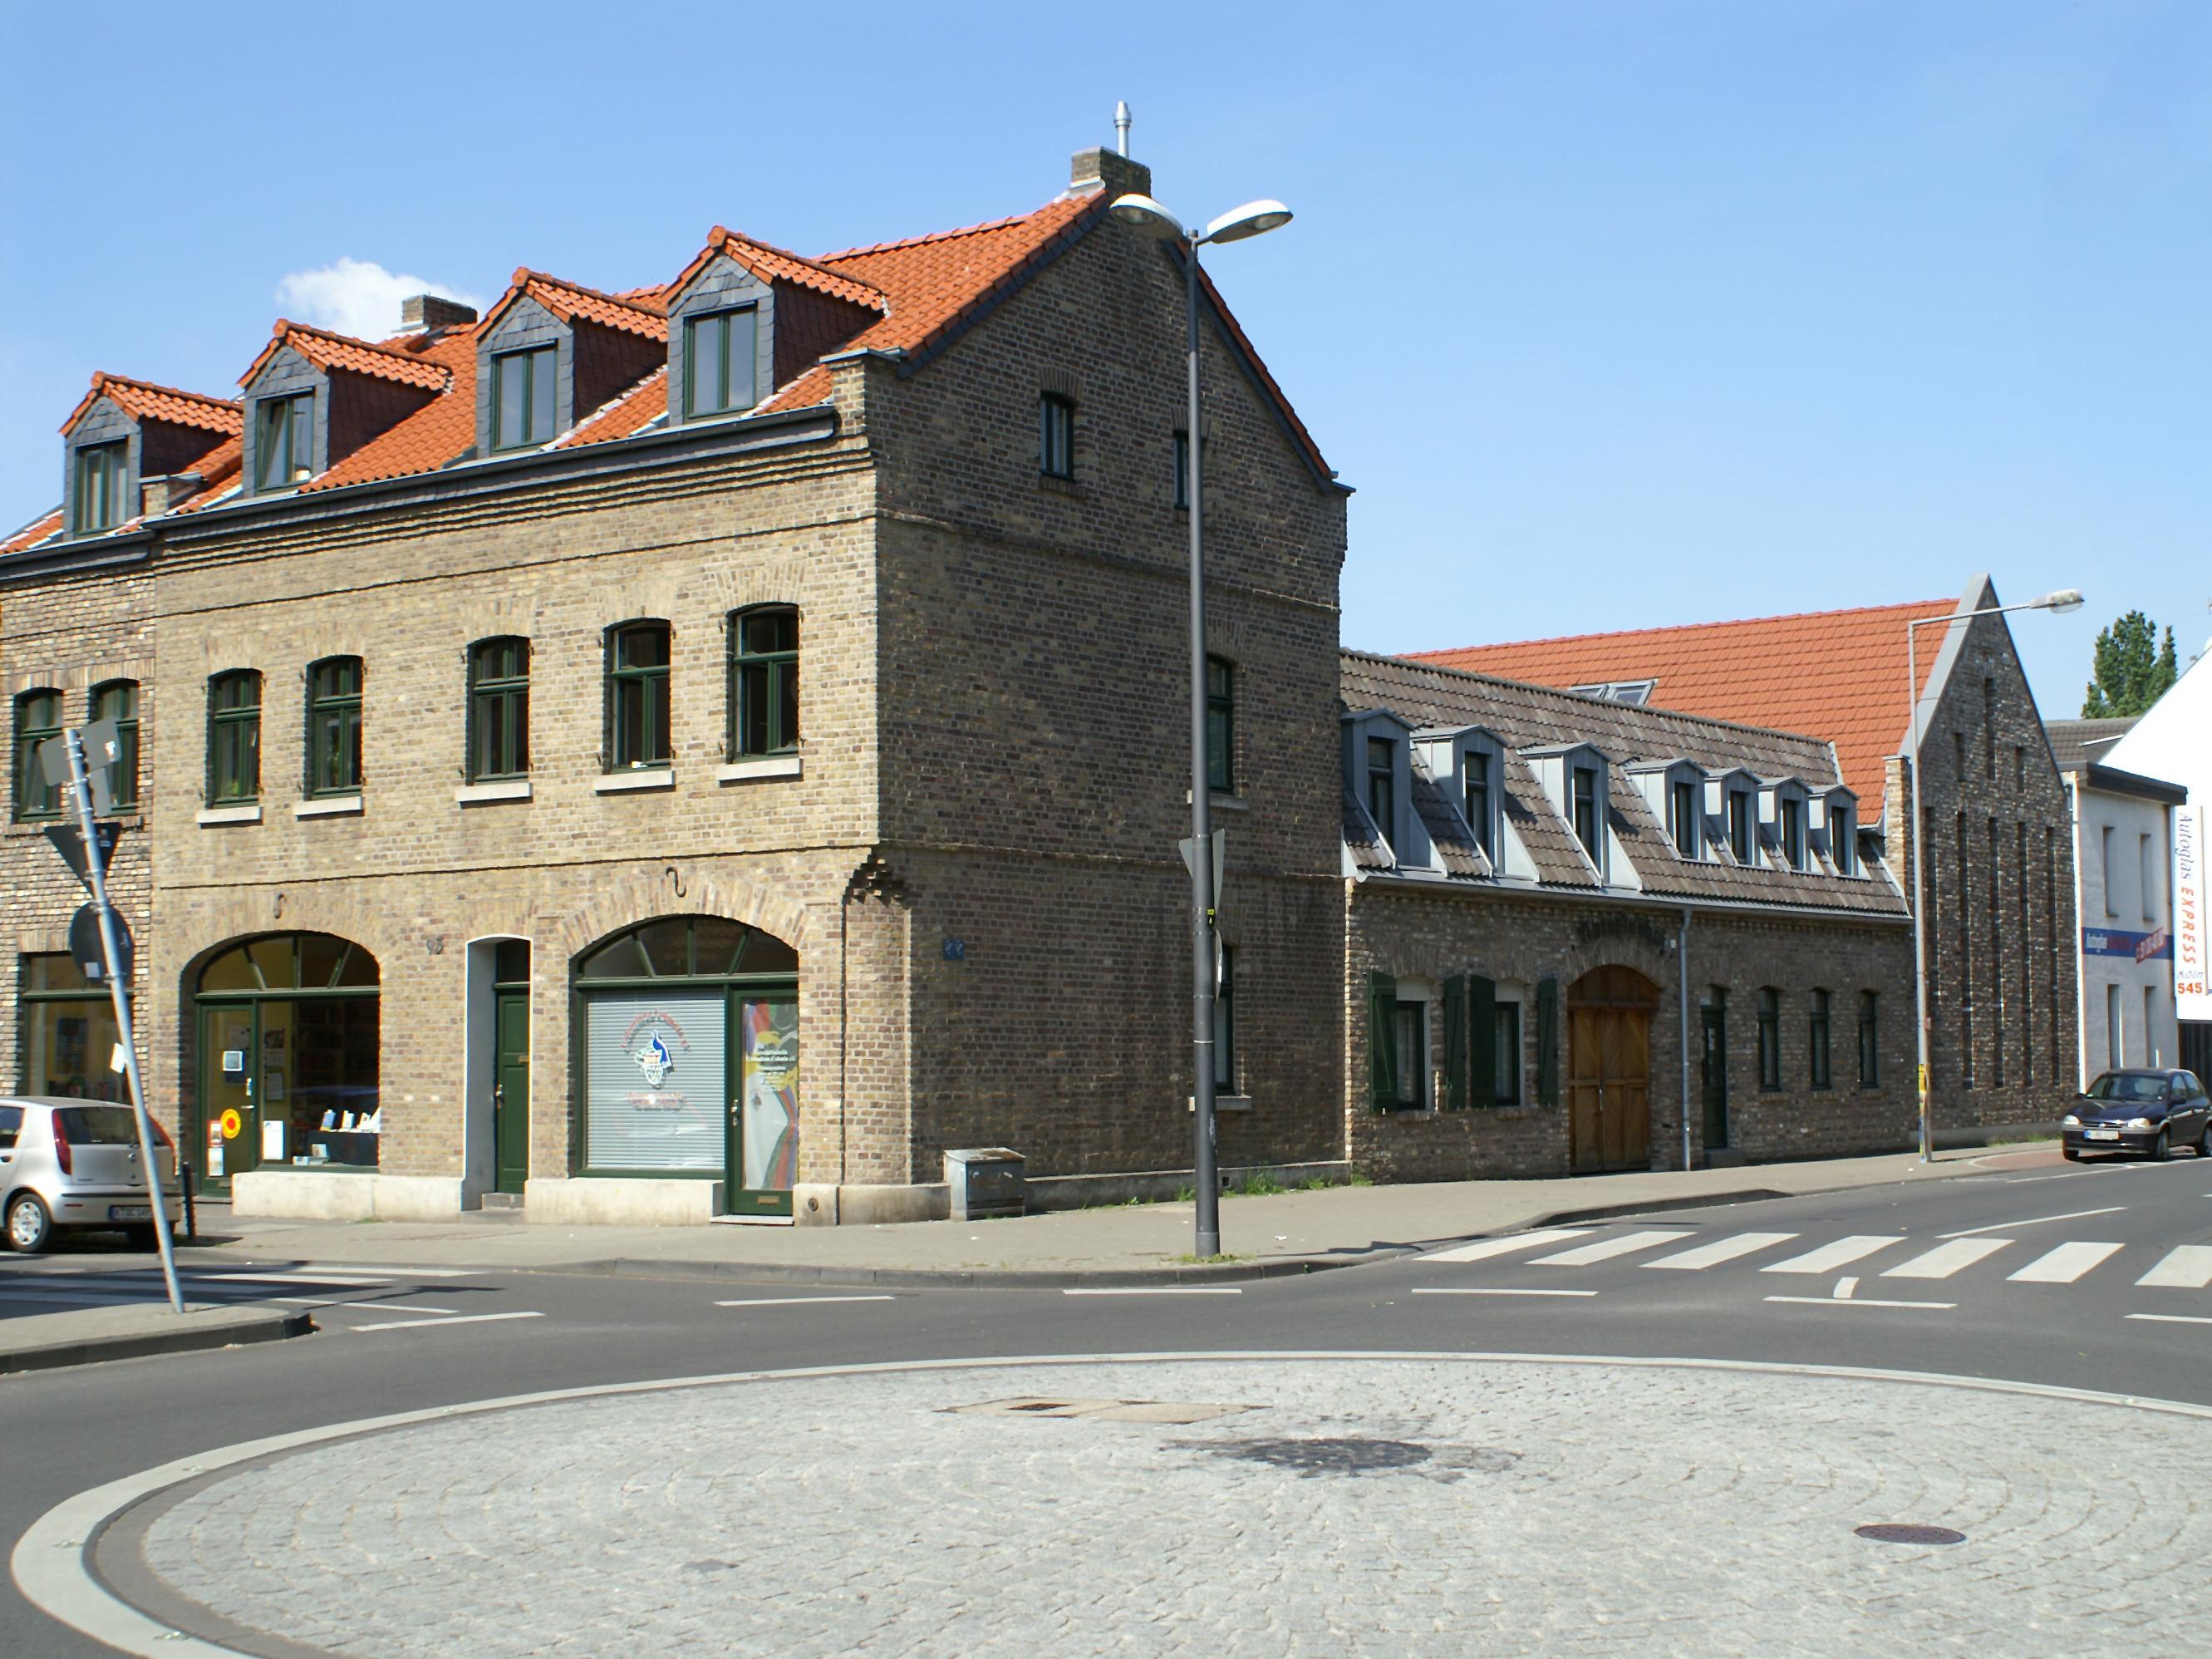 Köln-Bickendorf